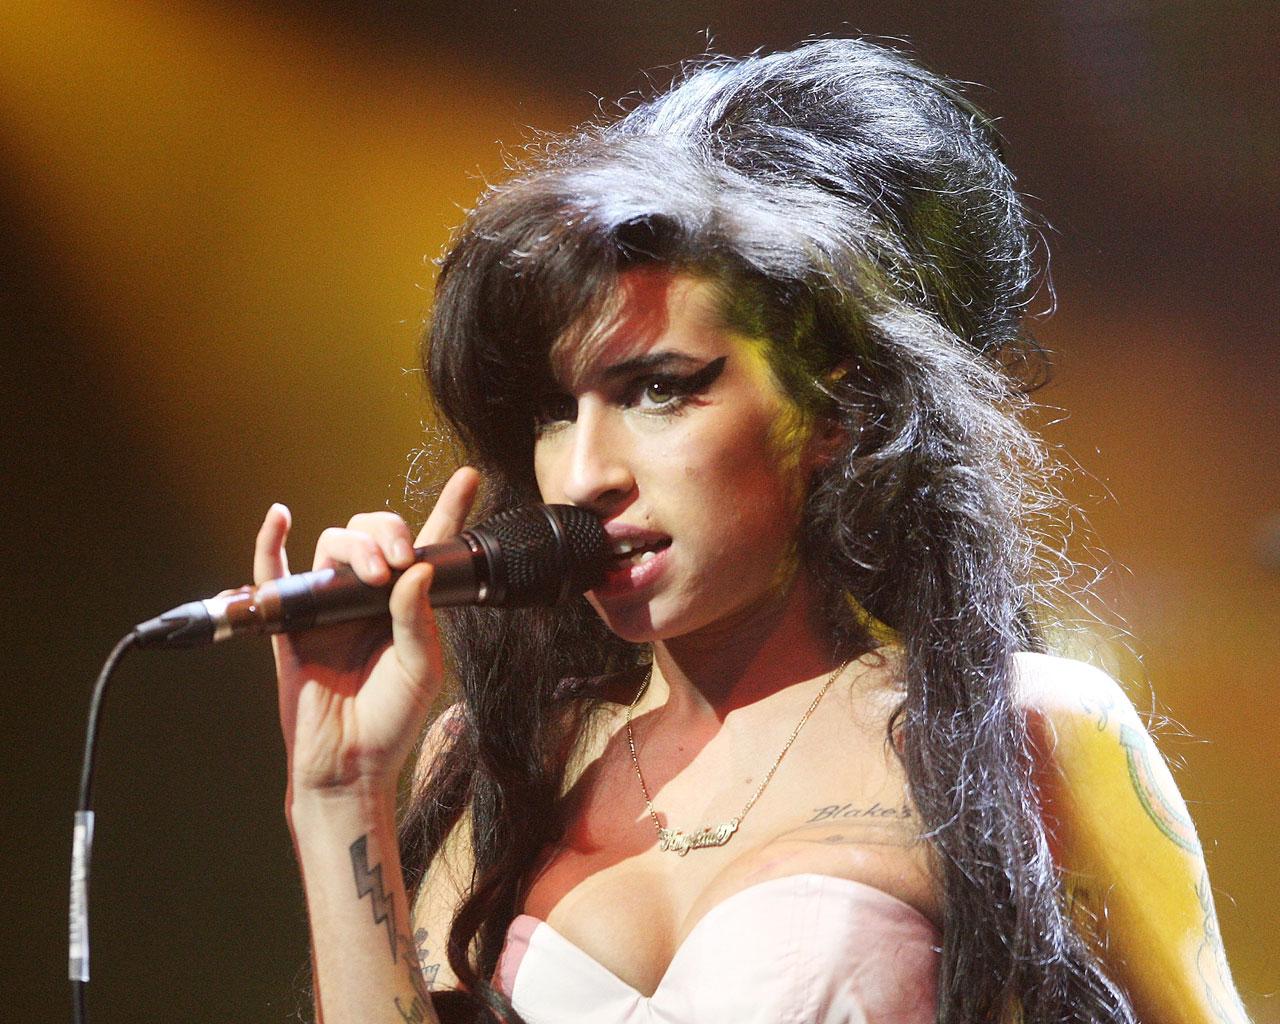 https://4.bp.blogspot.com/_csogD6ptEnI/SwD5hhIfq1I/AAAAAAAADhU/0YR1R8yit1Y/s1600/Amy_Winehouse_08.jpg